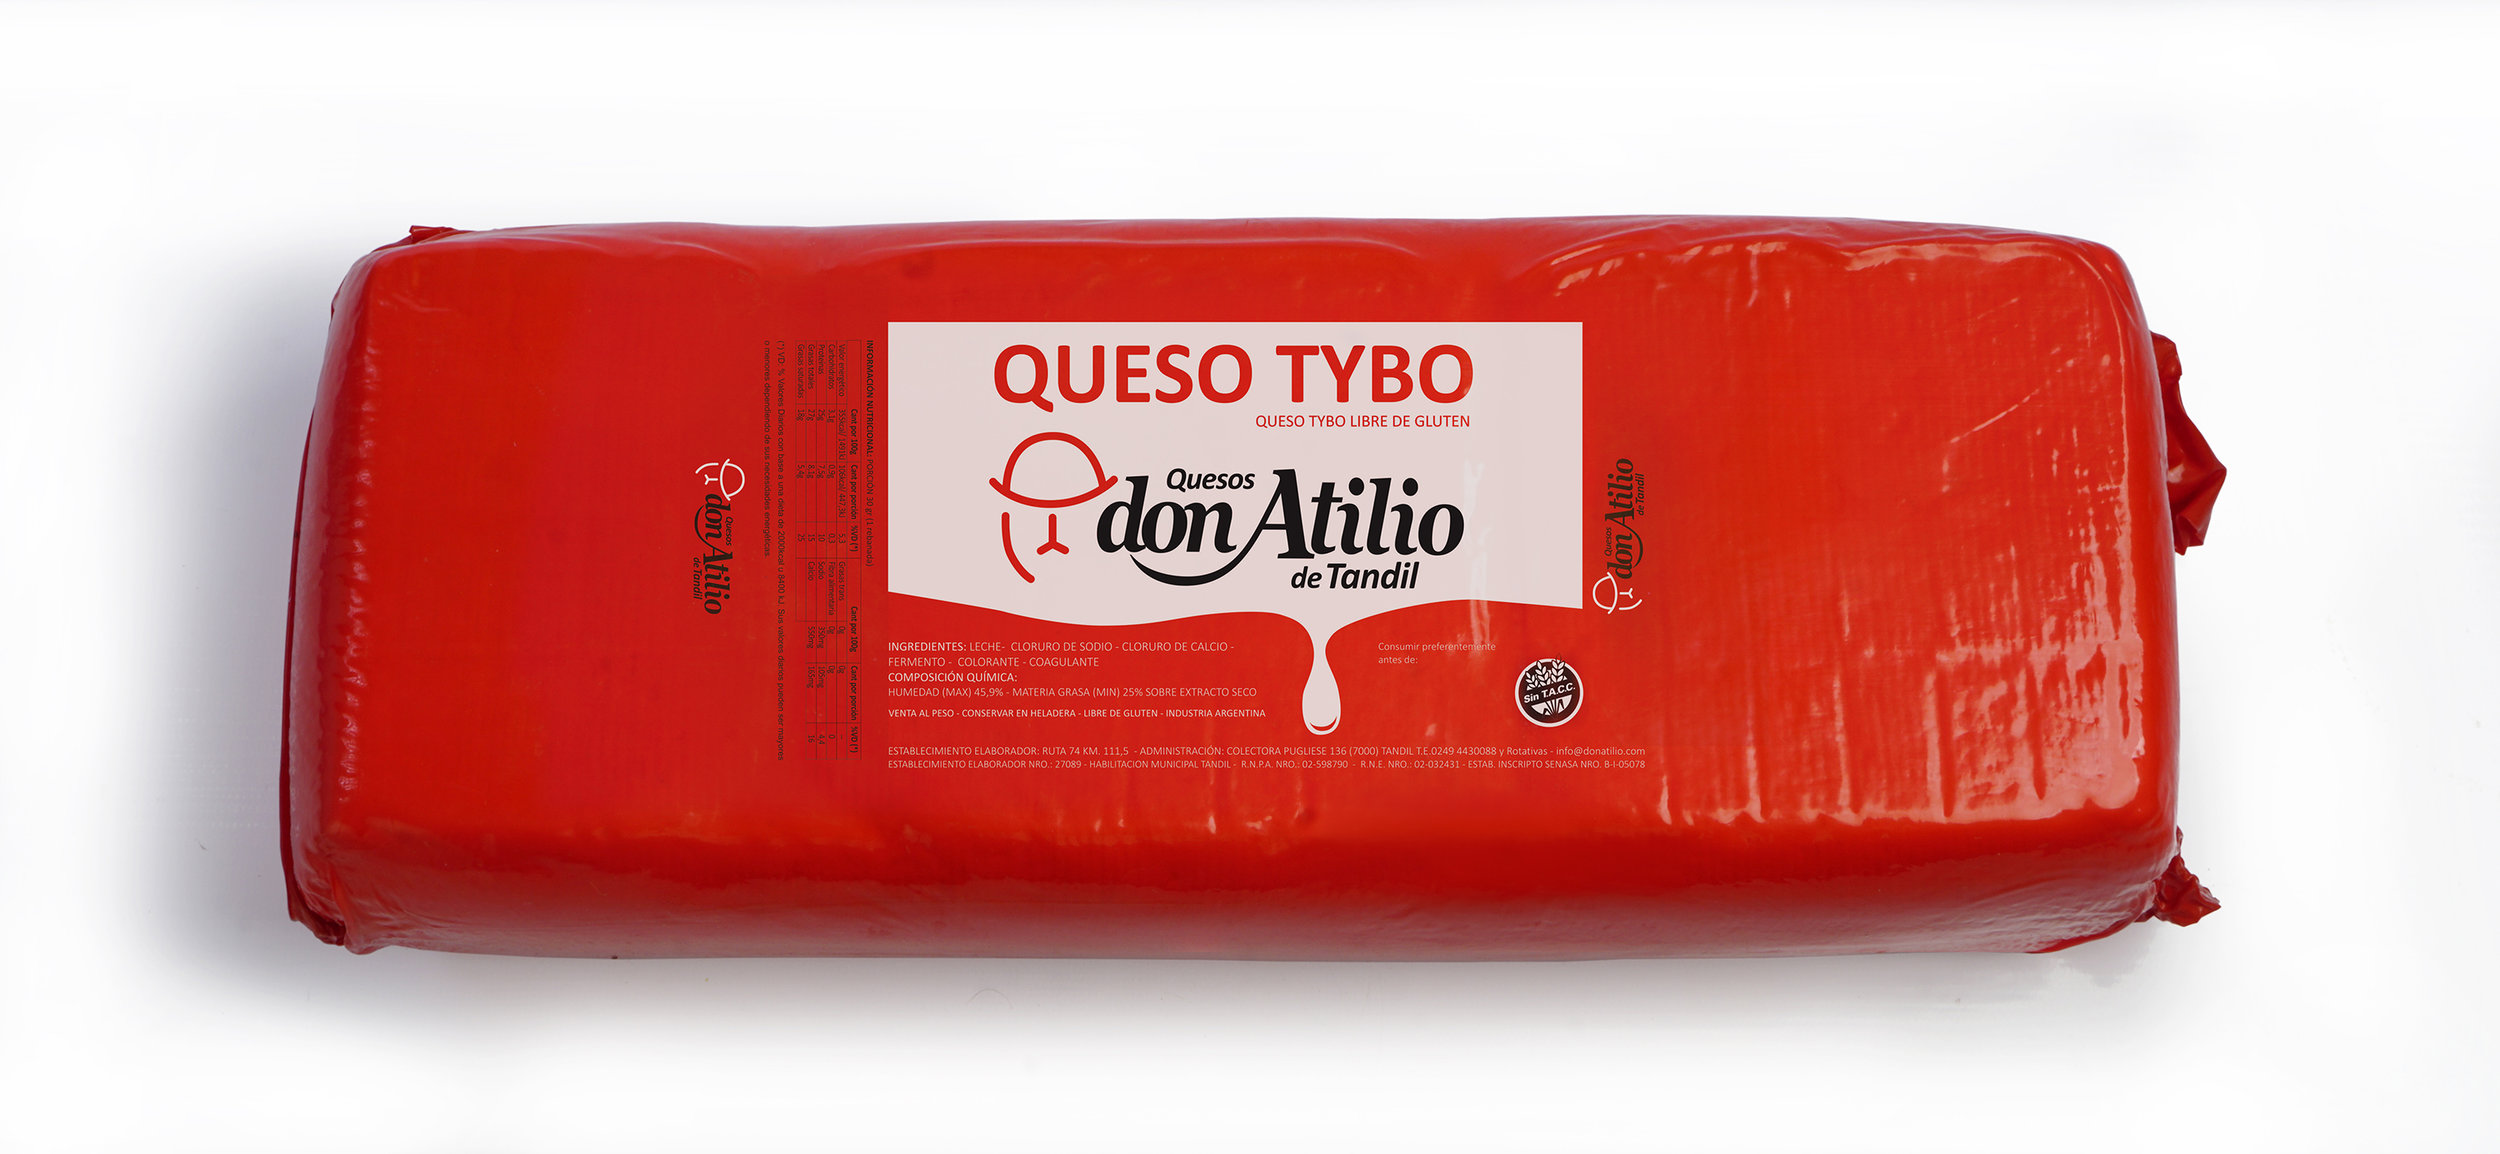 Qso Tybo.jpg